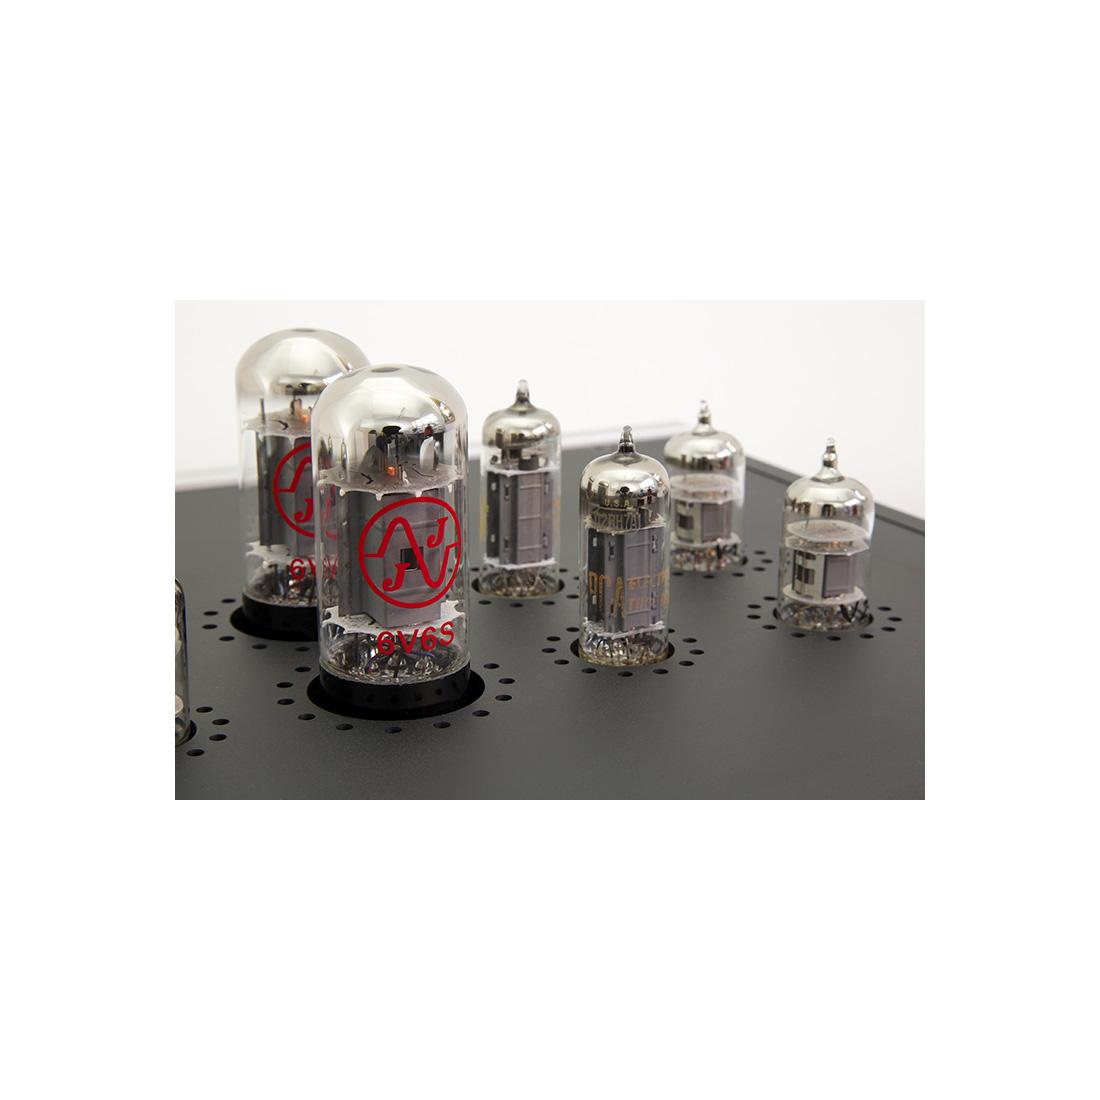 The tube rectifiers and voltage regulators -